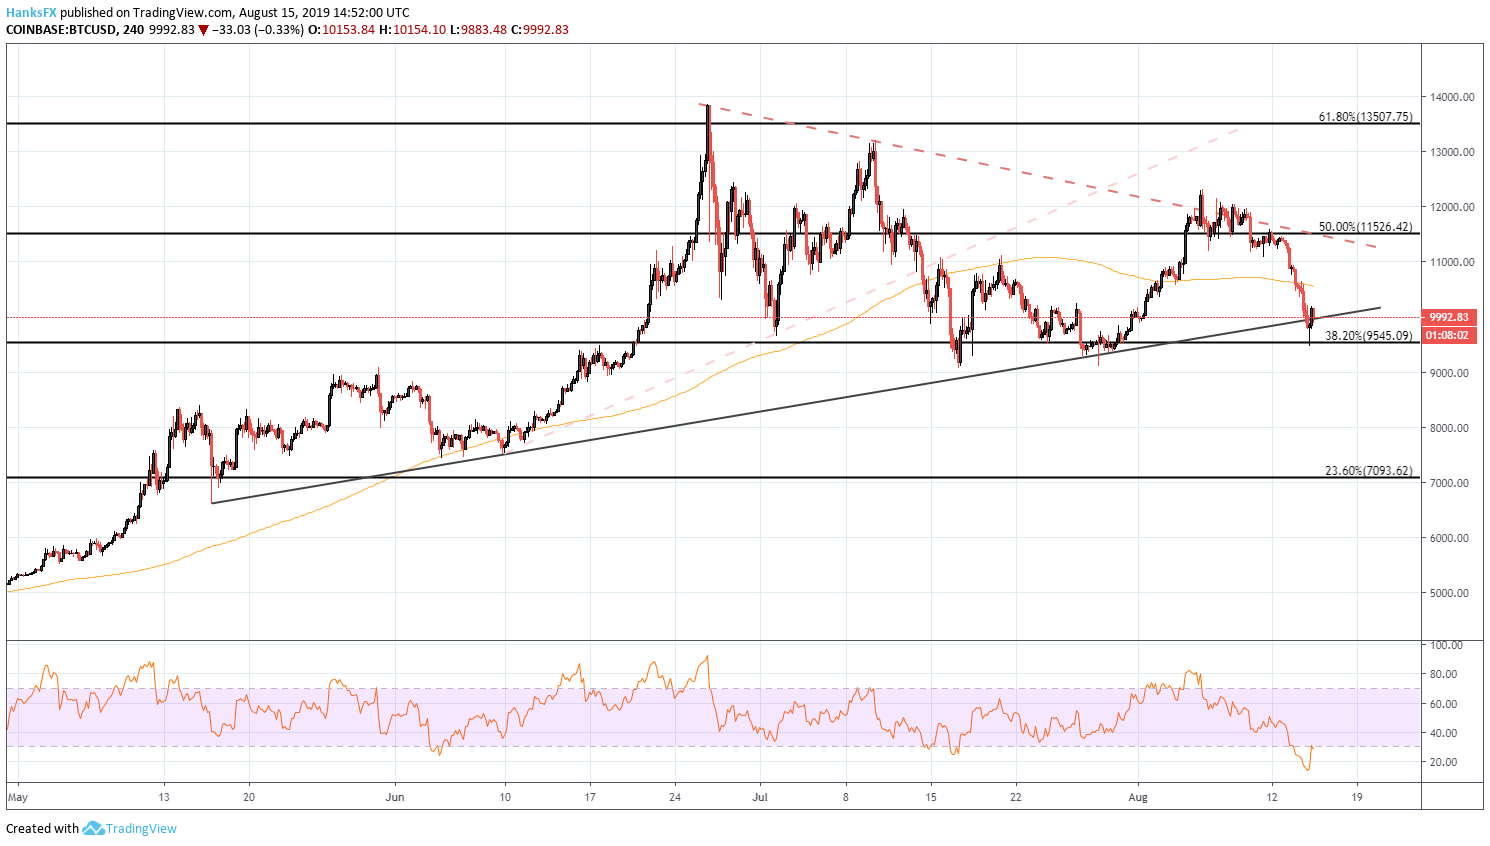 Bitcoin Price Forecast: Trendline Under Fire as BTC Breaks